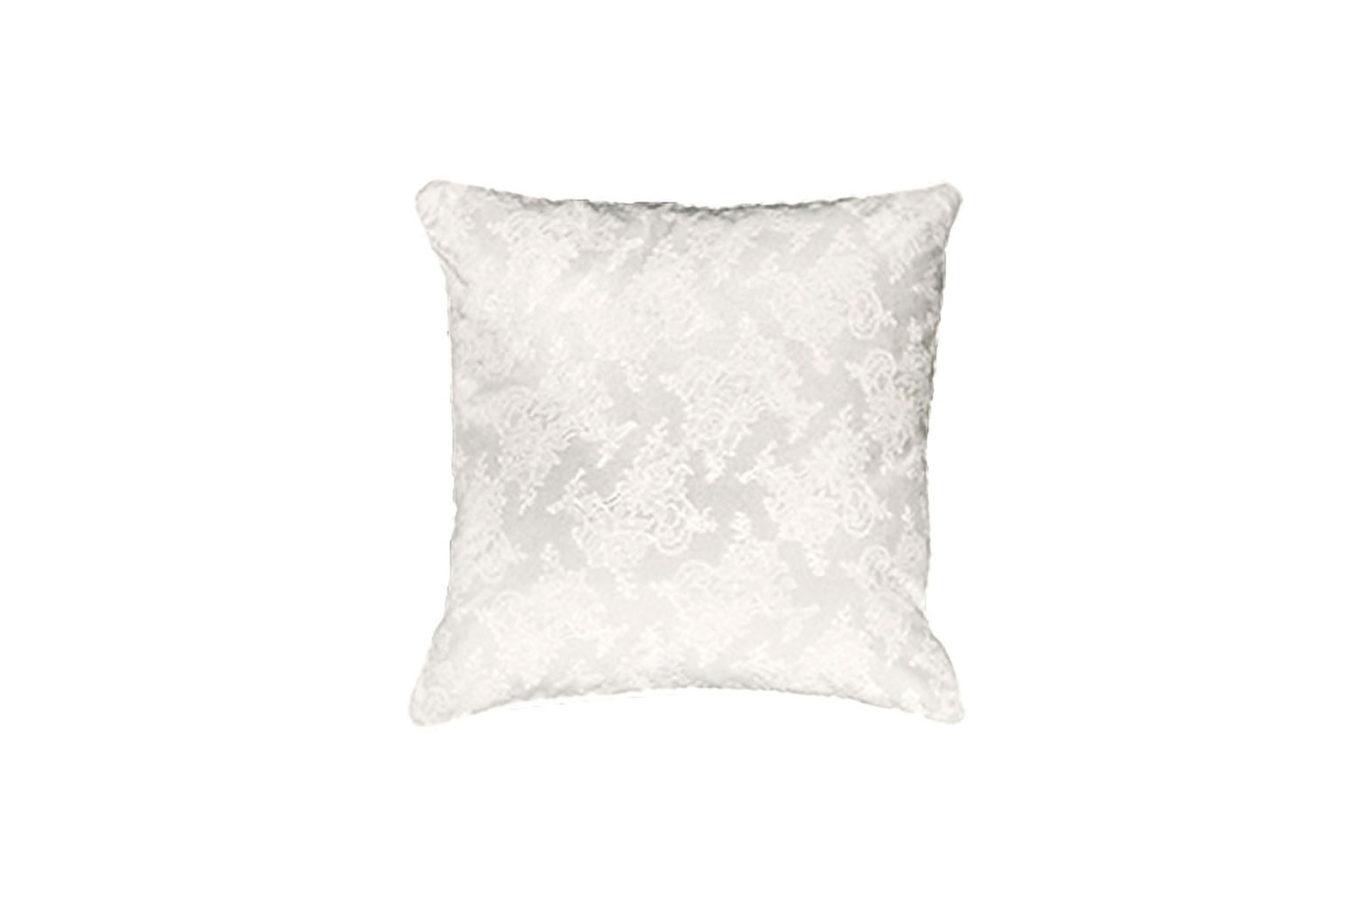 Gianfranco Ferre Home Burlesque Cushion 01